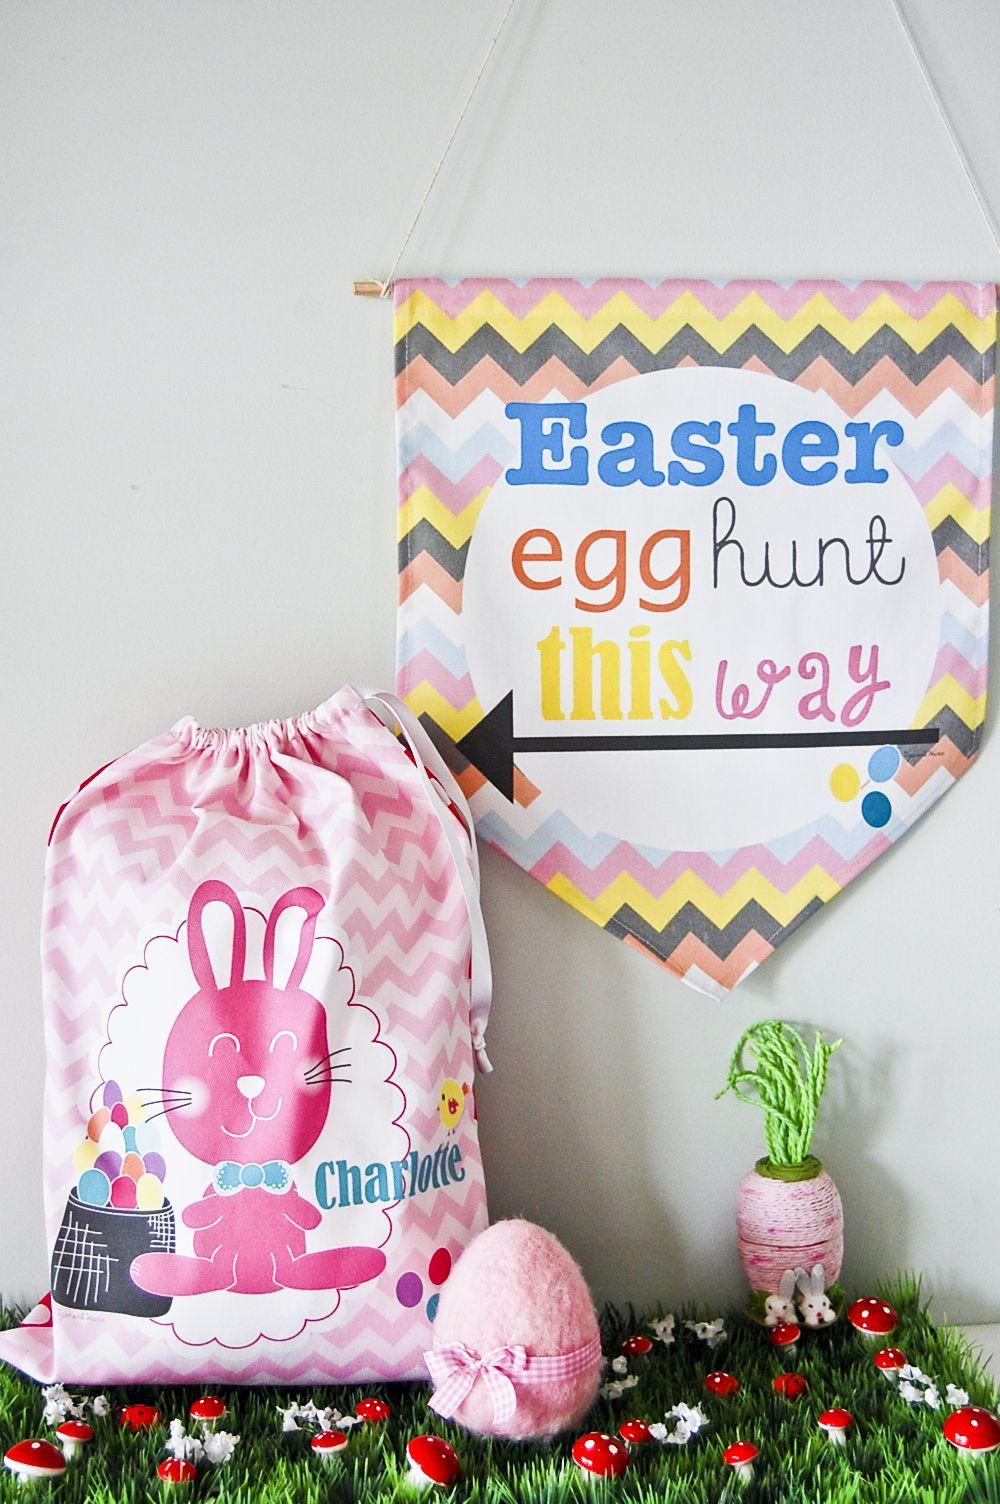 Easter has arrived  #easter #eastereggs #easterbunny #easteregghunt #easterrabbit #easterdecorations #eastergifts #babiesfirsteaster #tigesandweince #kylieloy #kidsdecor